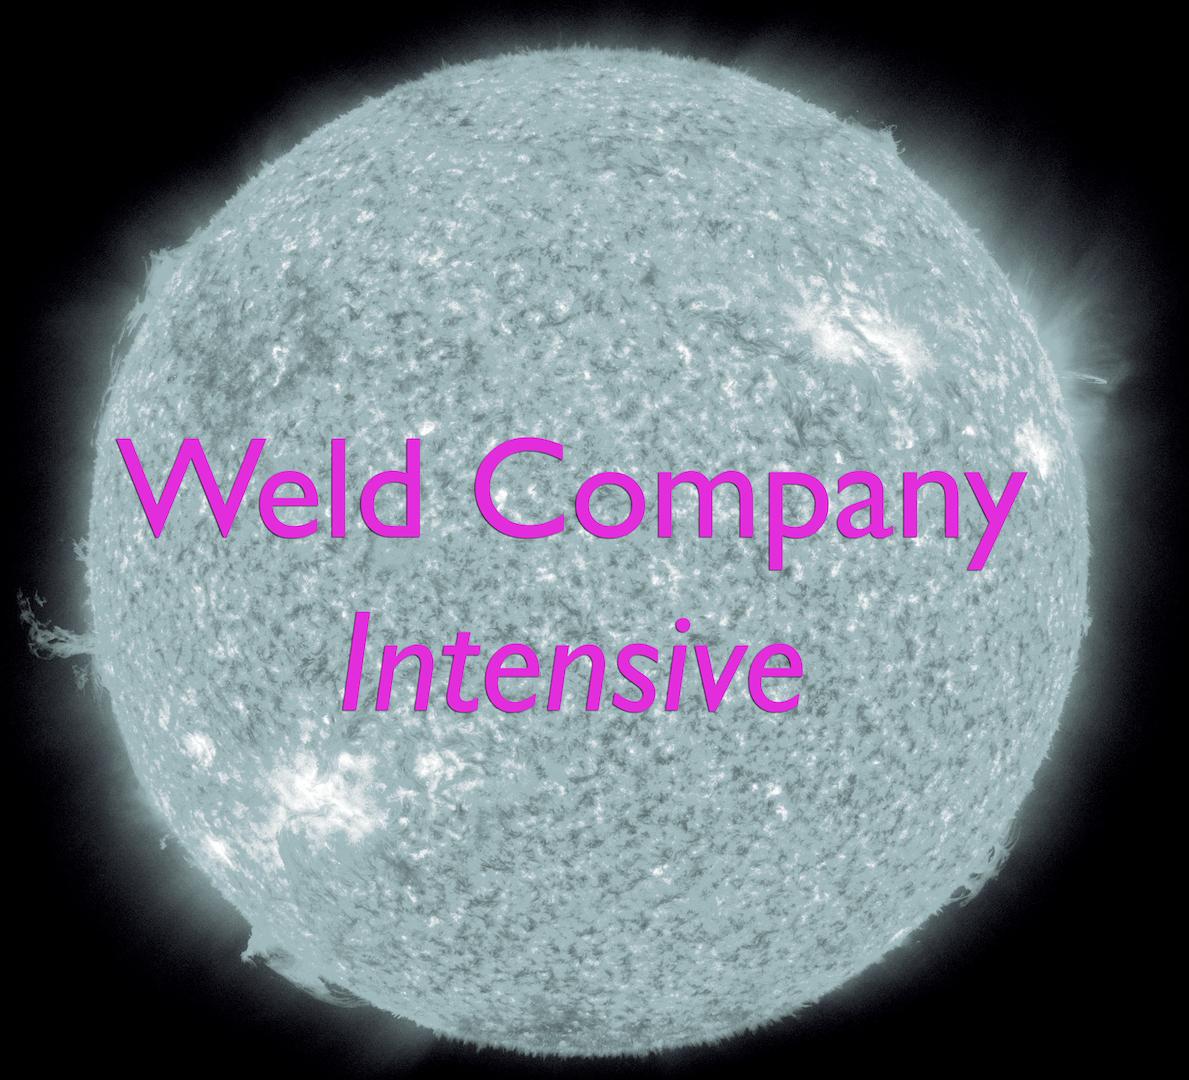 Weld Company Intensive